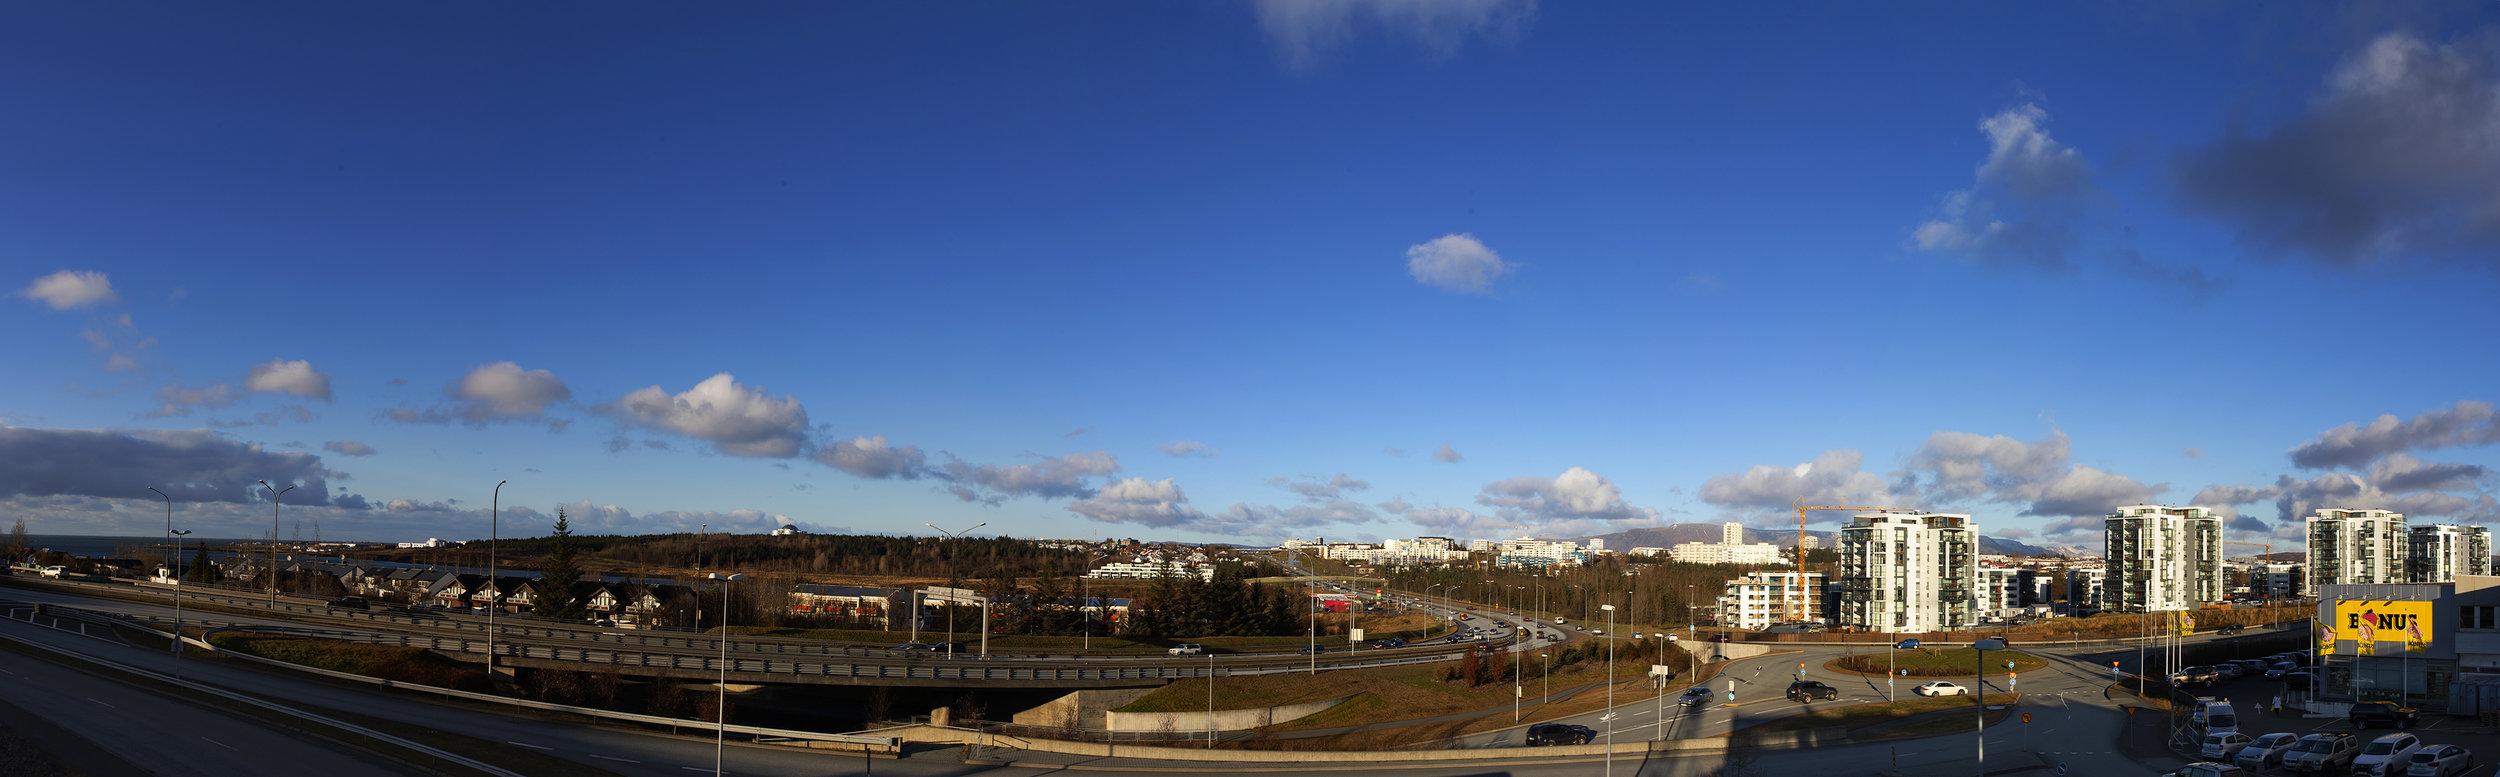 dalvegur-panorama-mynd-crop.jpg